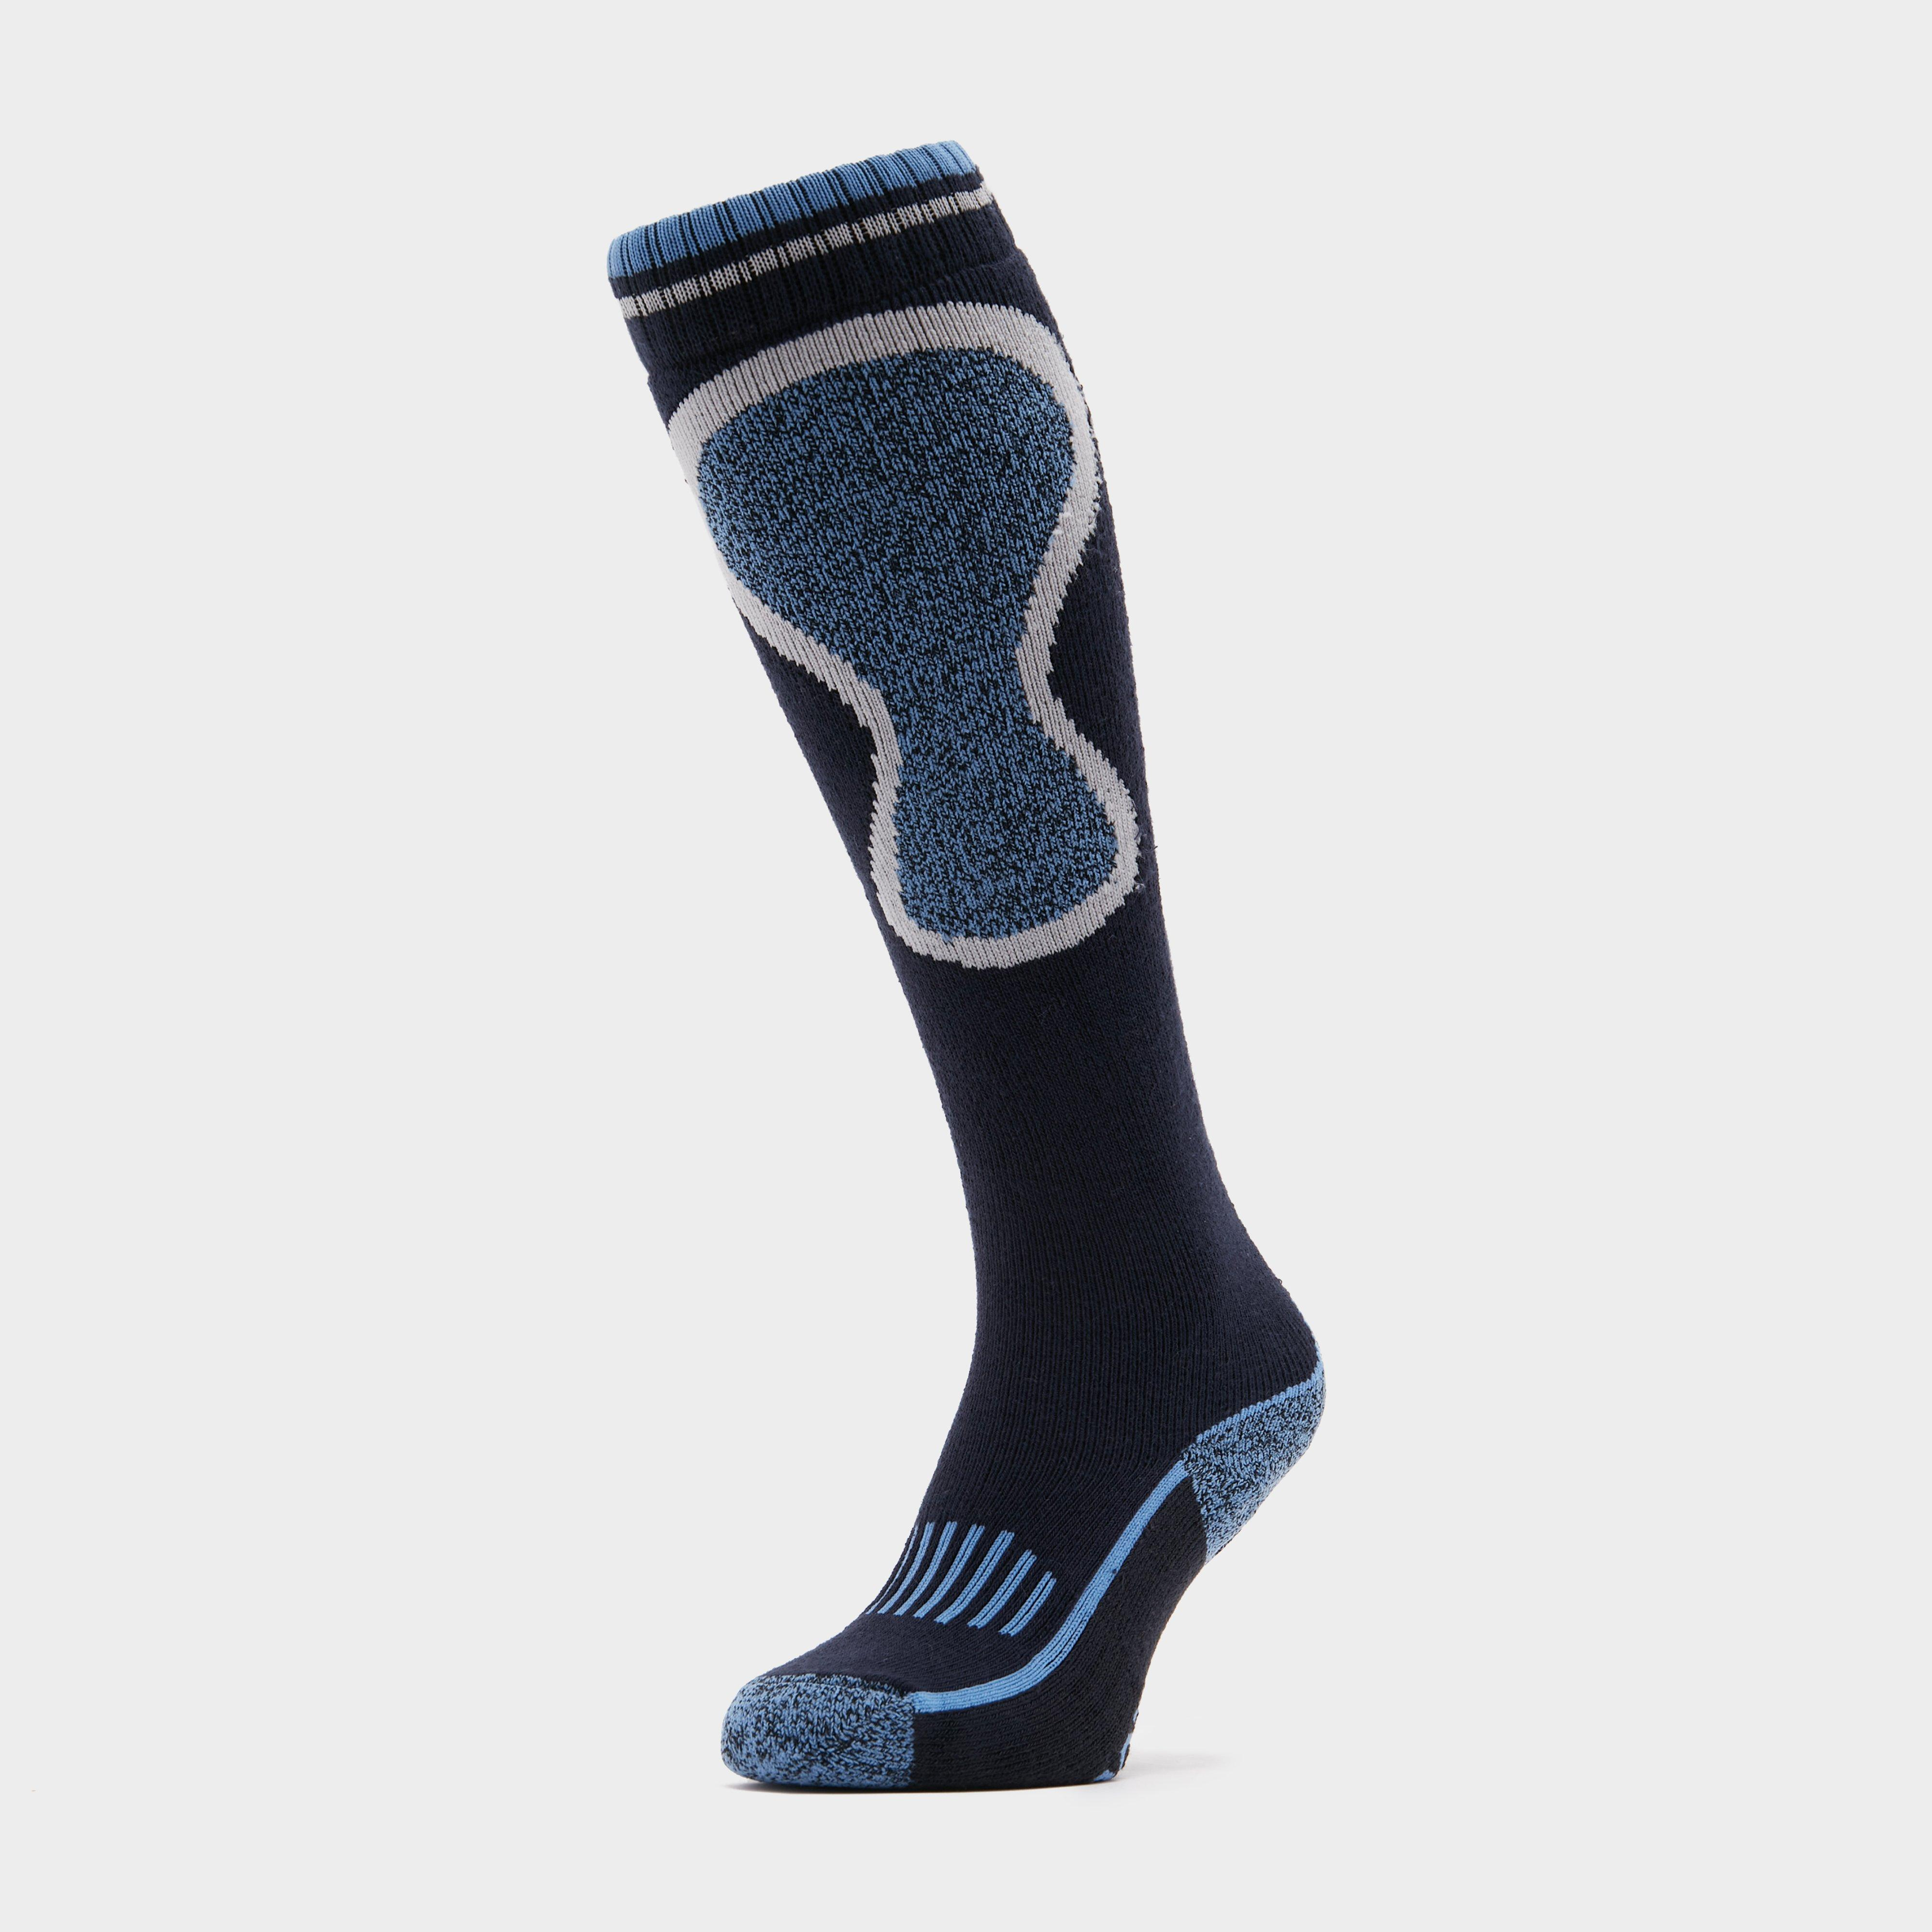 Image of Storm Bloc Women's Patterdale Logo Long Socks - Navy Blue/Navy Blue, Navy Blue/Navy Blue